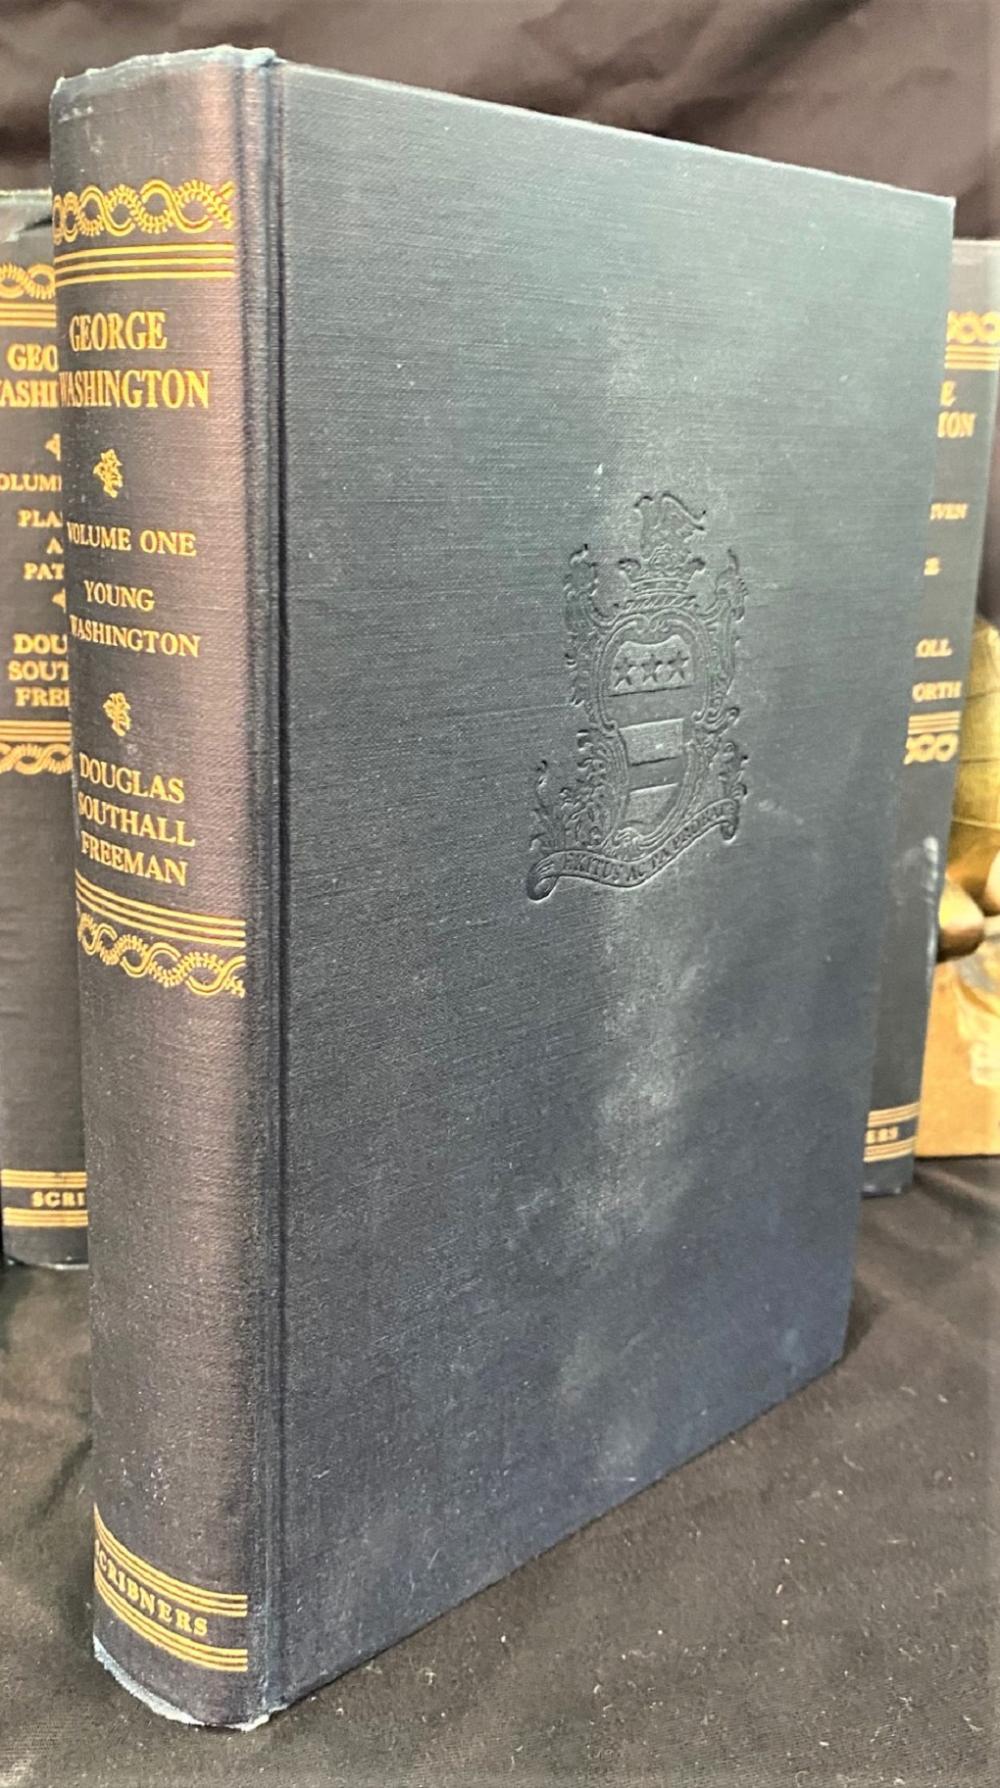 GEORGE WASHINGTON BY DOUGLAS SOUTHALL FREEMAN - 7 VOLUMES, 1948-1957